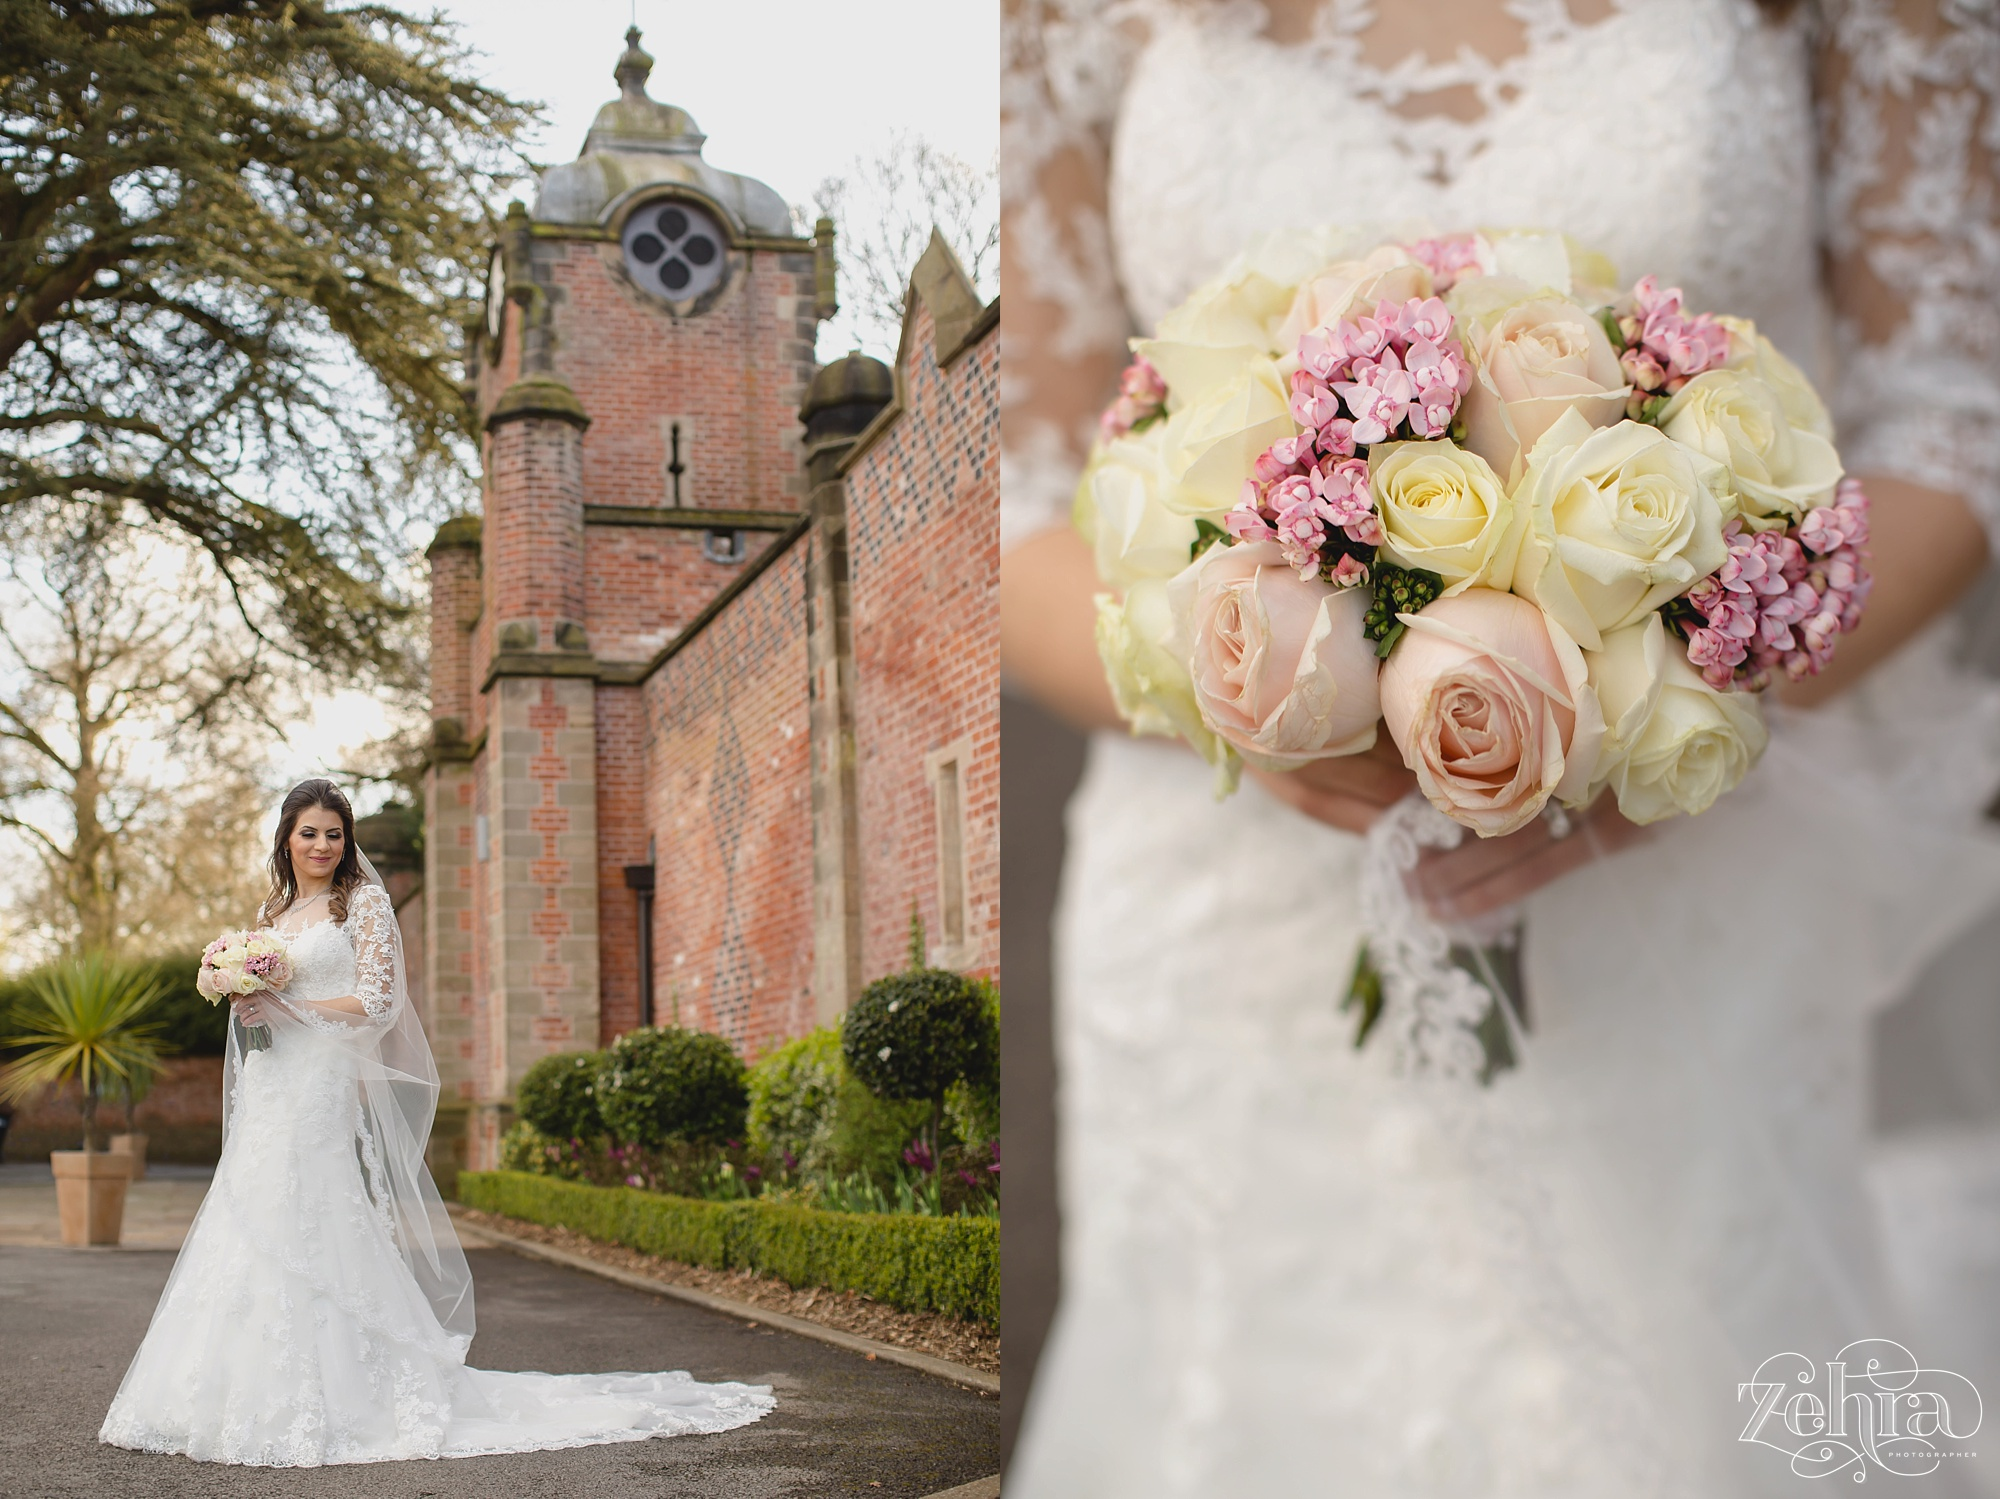 zehra photographer mere cheshire wedding_0023.jpg